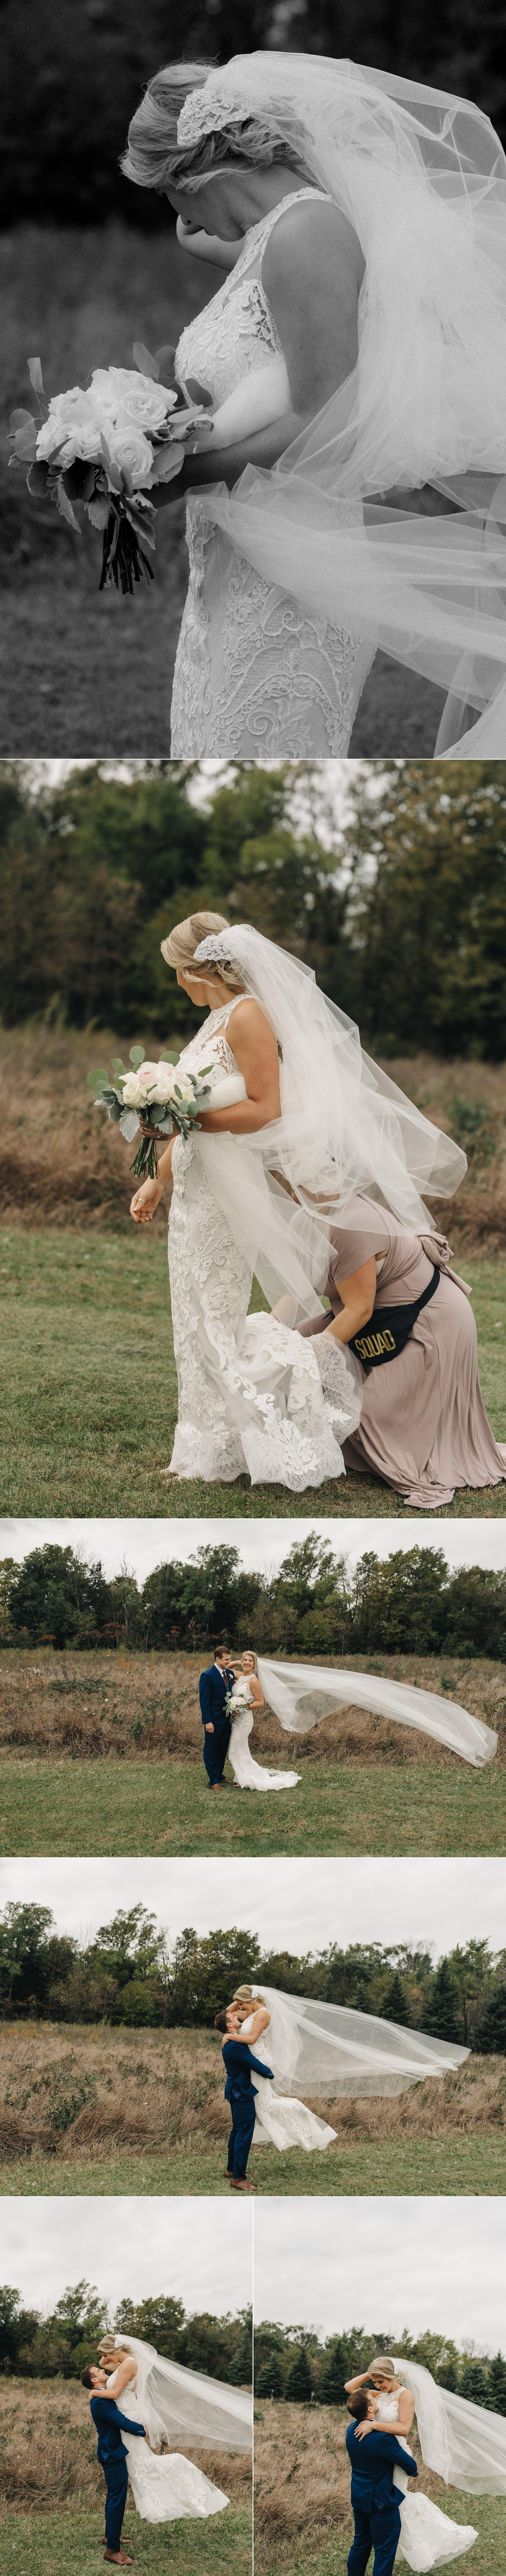 elopement-photographer-austin-best-wedding-minneapolis-adventurous-wedding-modern-morocco-new york-new orleans-mexica-costa rica-italy-affordable-best_0050.jpg